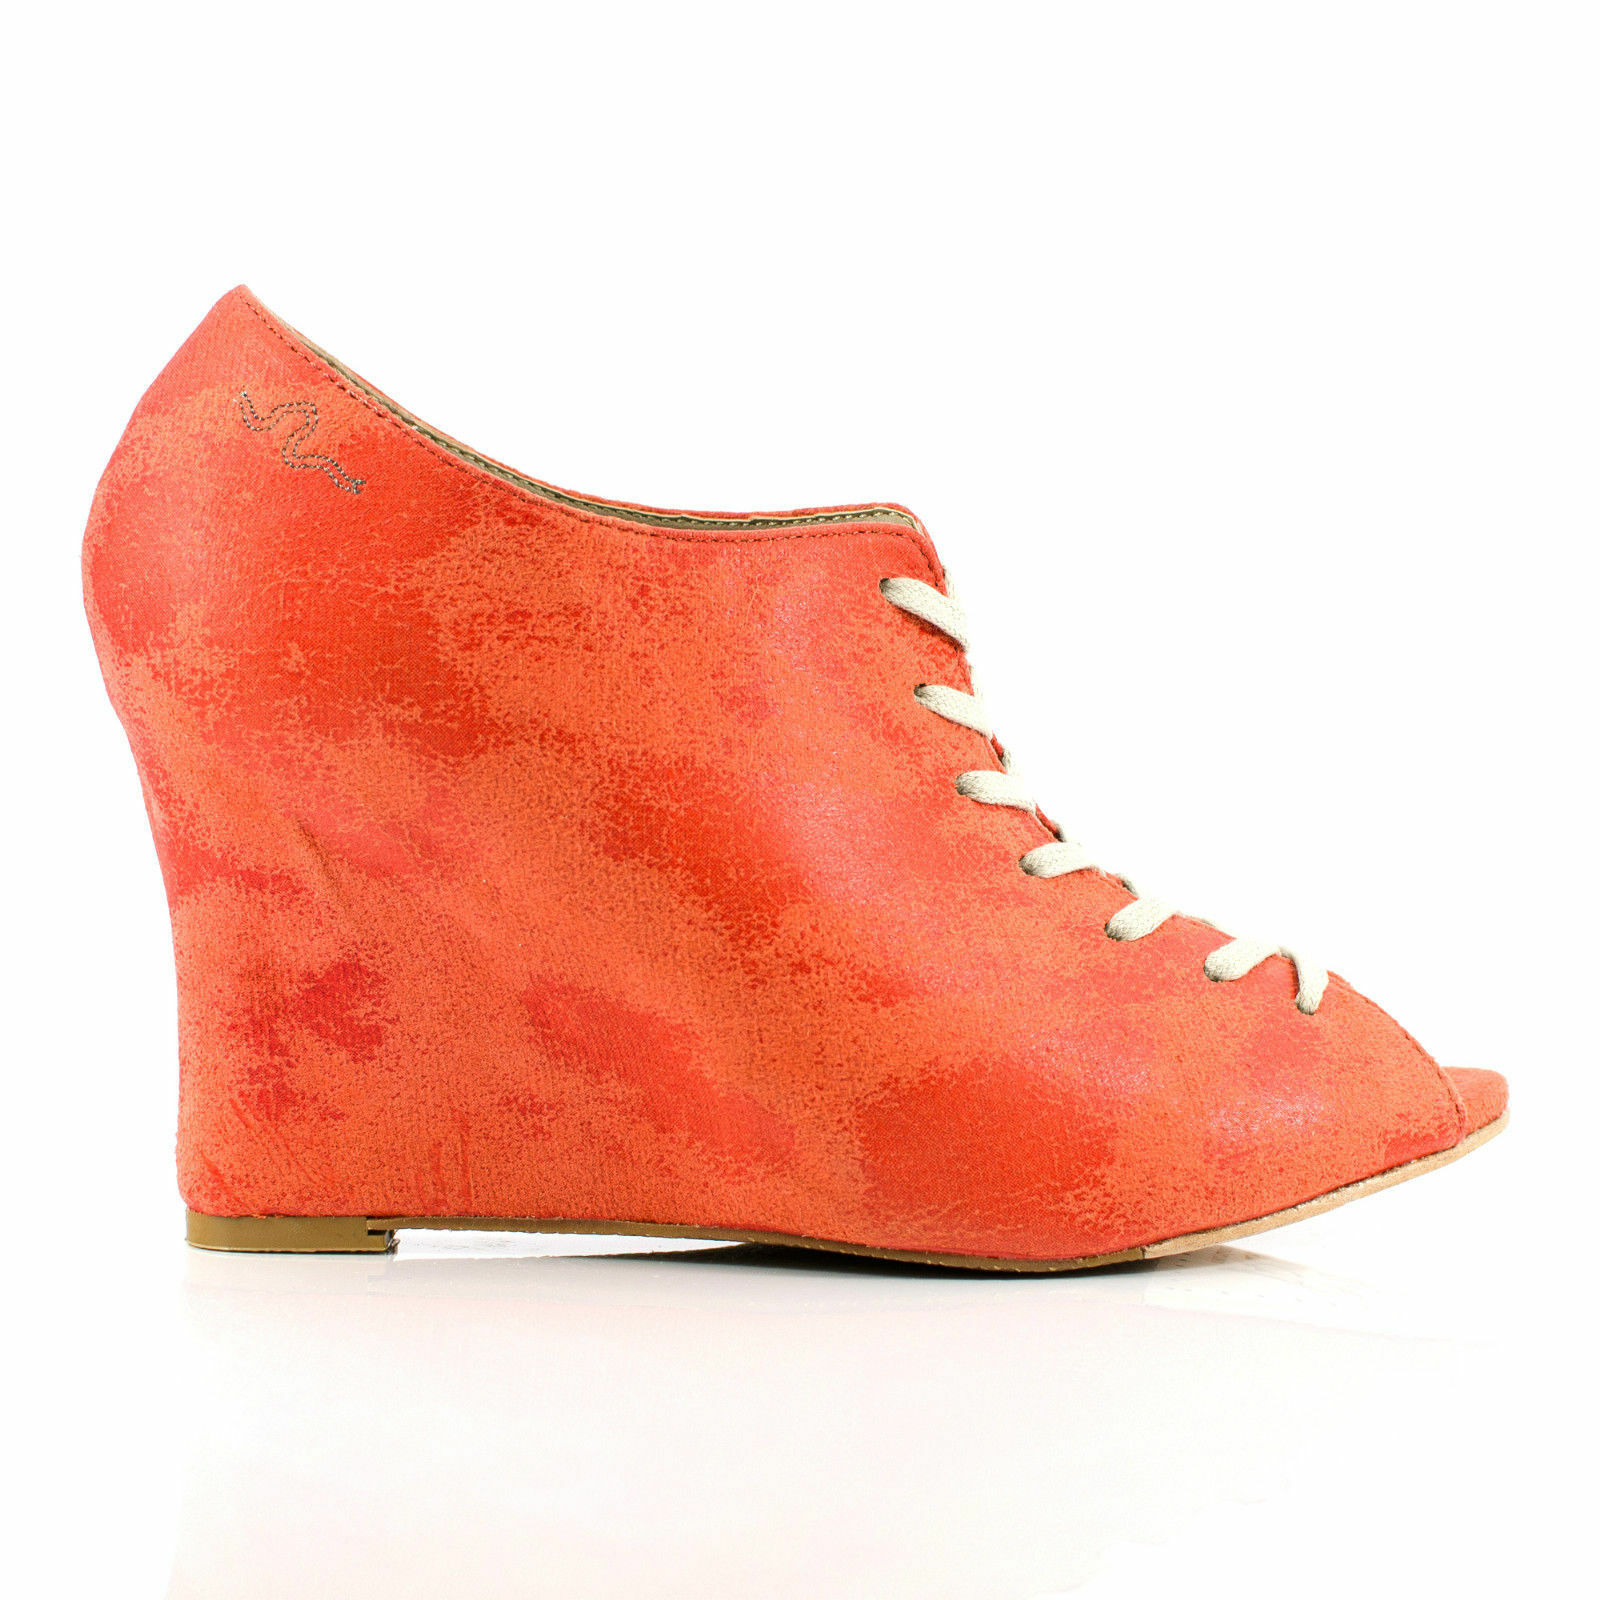 Feud Britannia London Women's Marianne Wedges Heels shoes size 7 8 orange